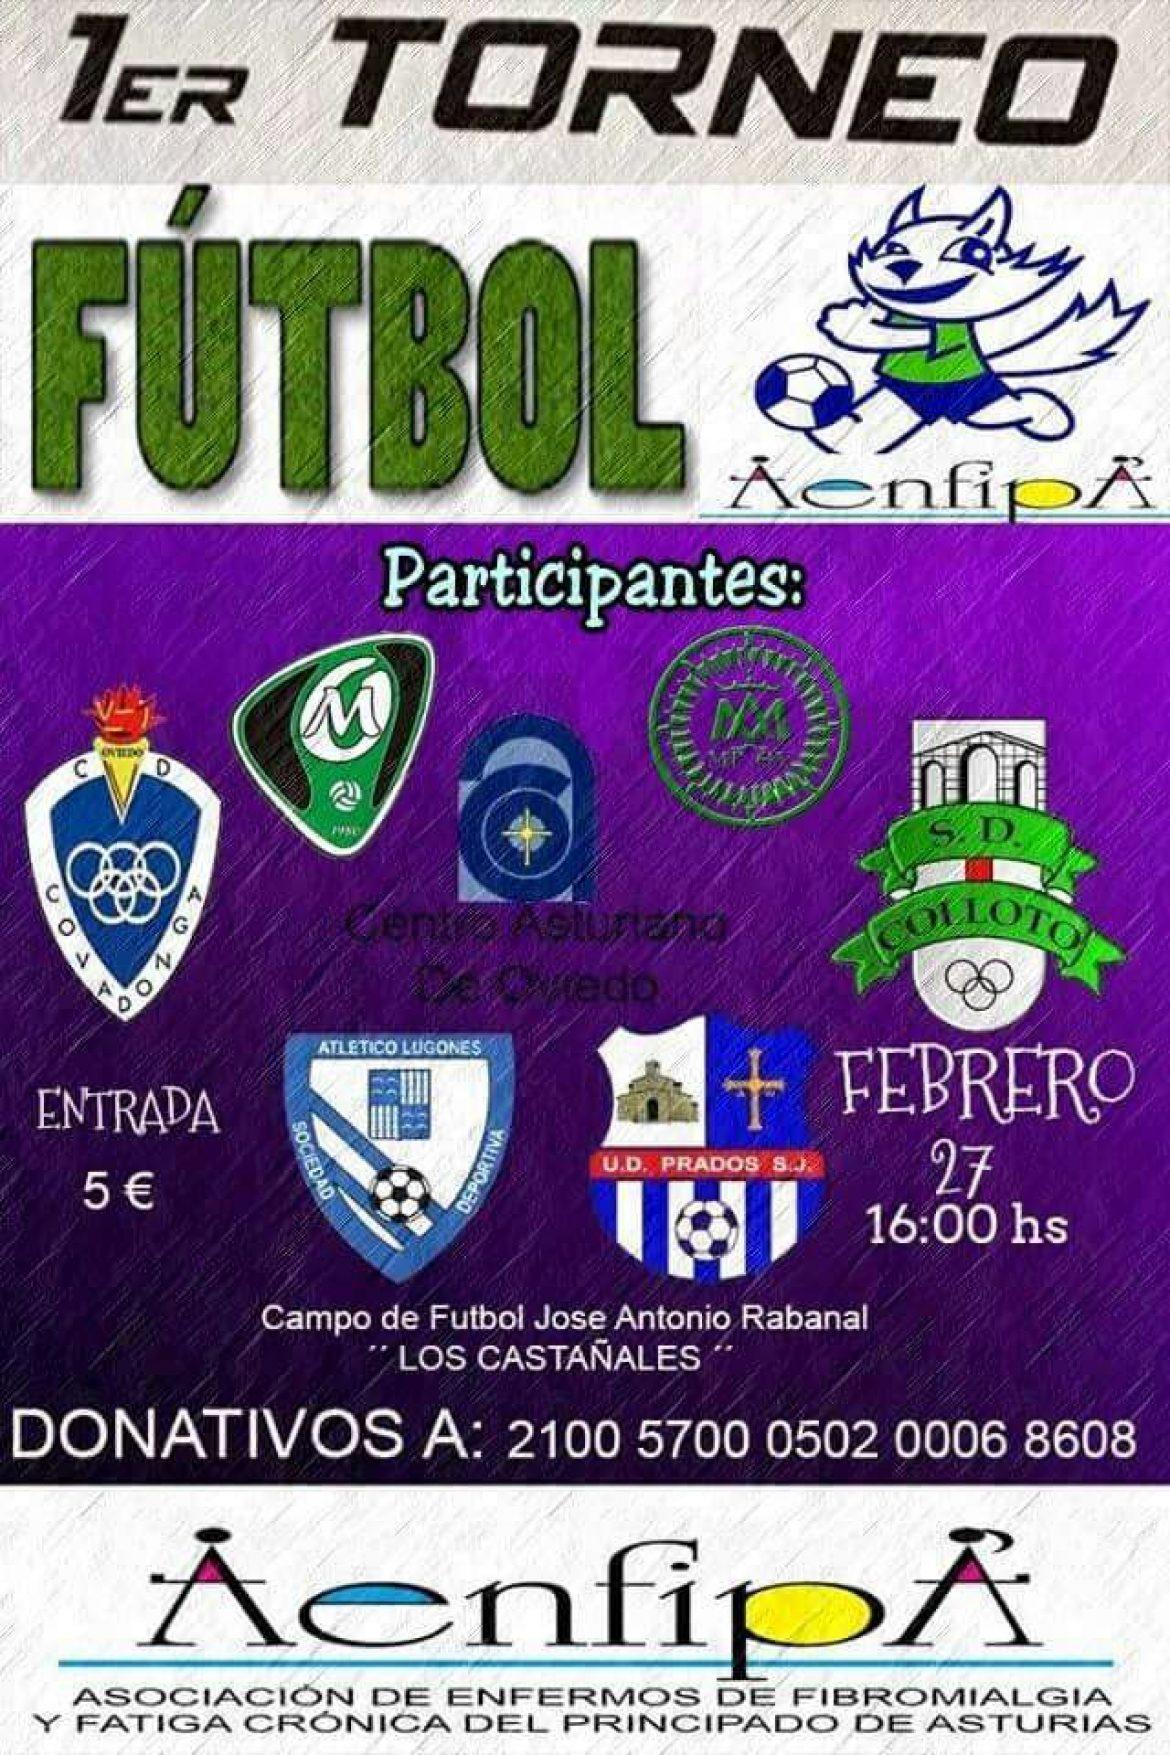 Gran éxito del I Torneo de Fútbol AENFIPA